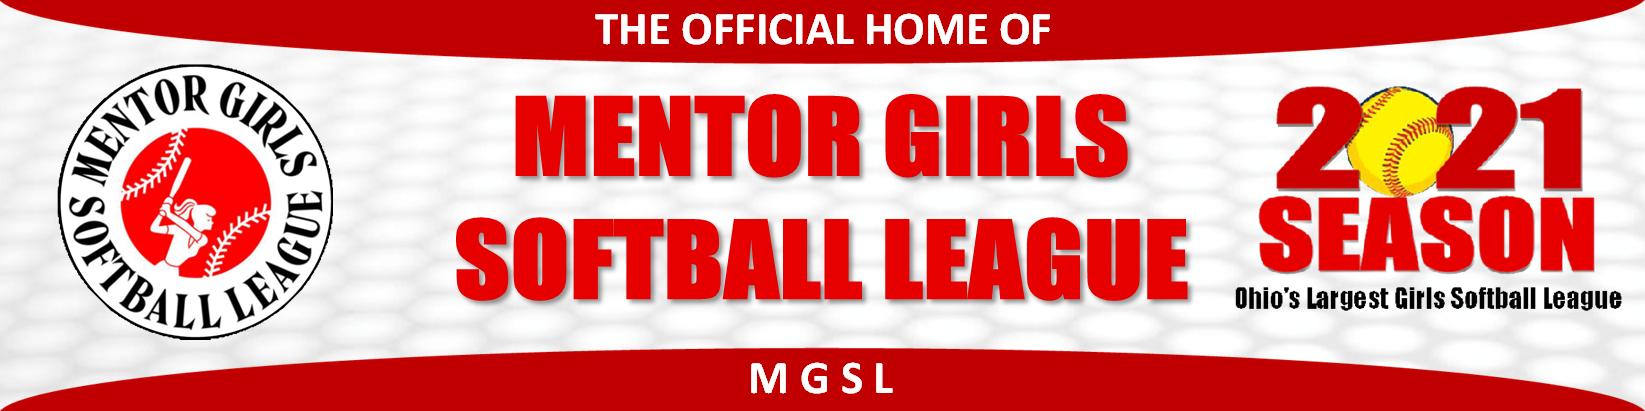 Mgsl website banner 2021